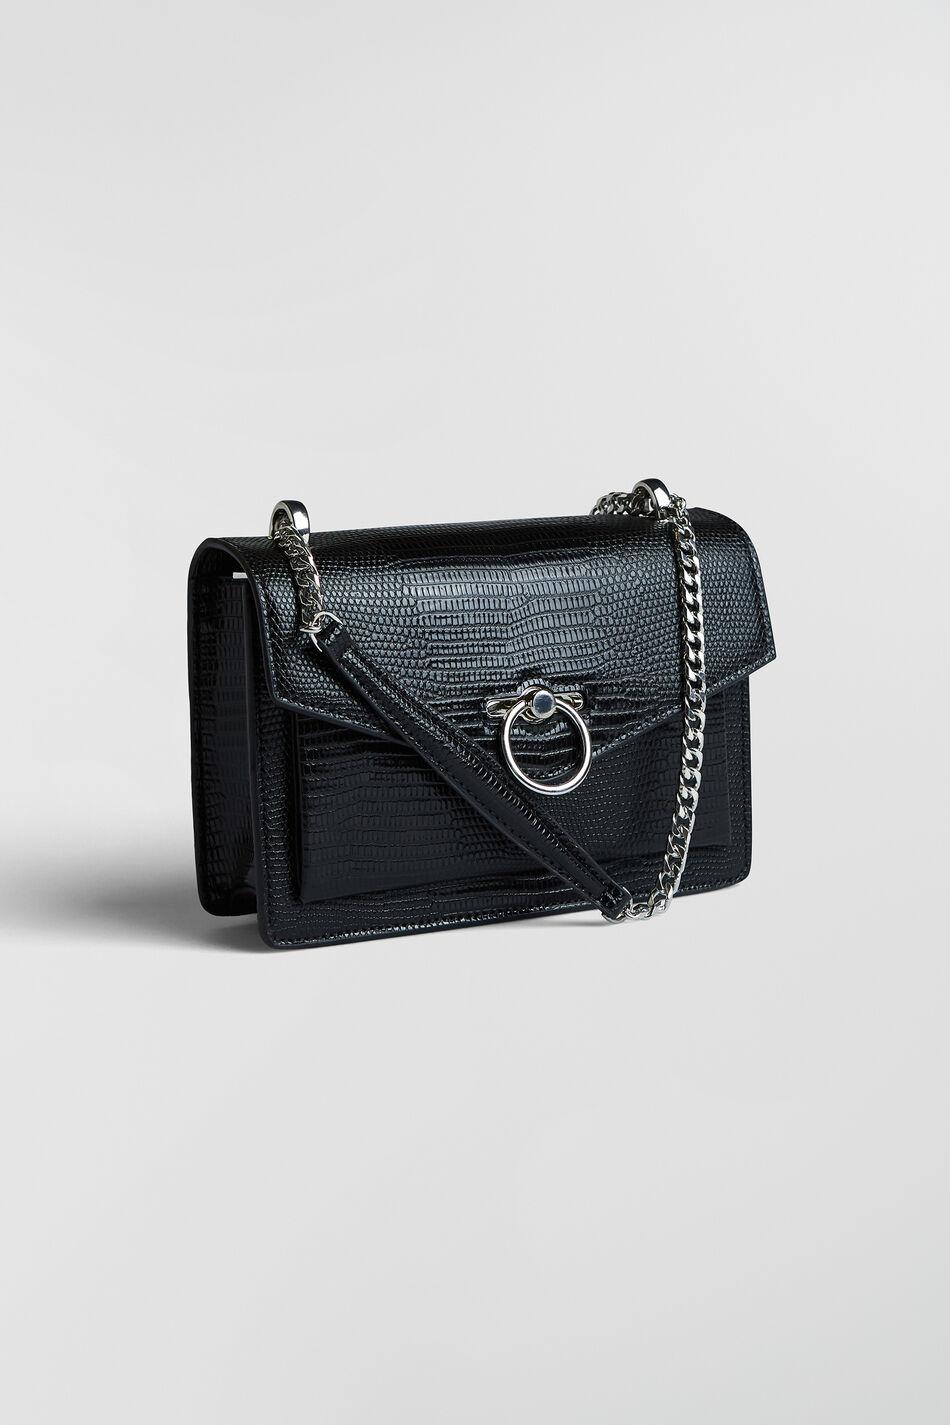 Gina Tricot Elinne bag ONESZ Female Black (9000)